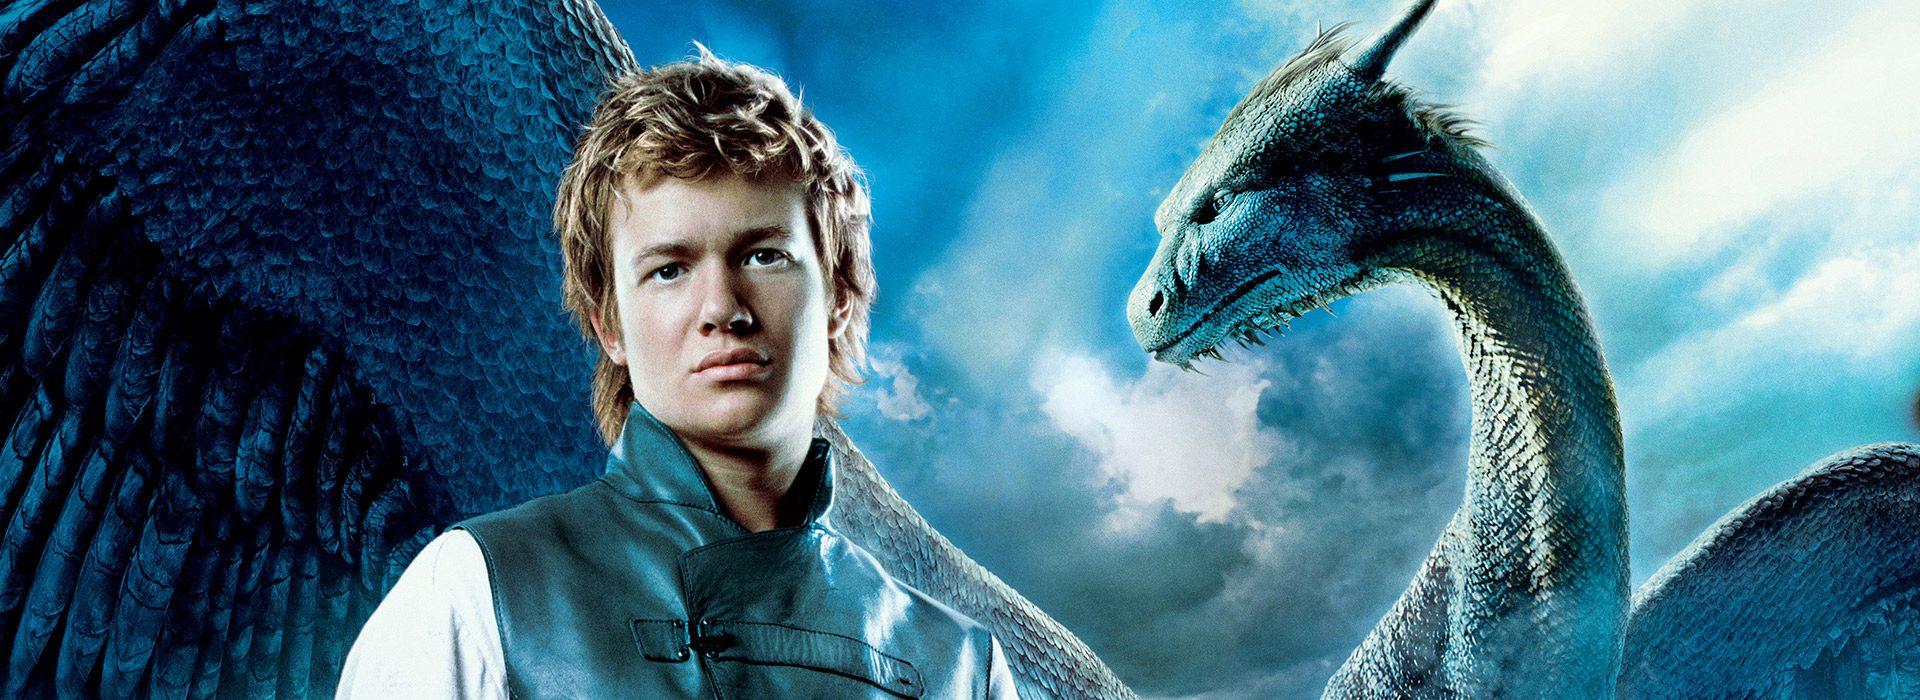 Cinematic Flashback: Eragon (2006) Review   Jason's Movie Blog